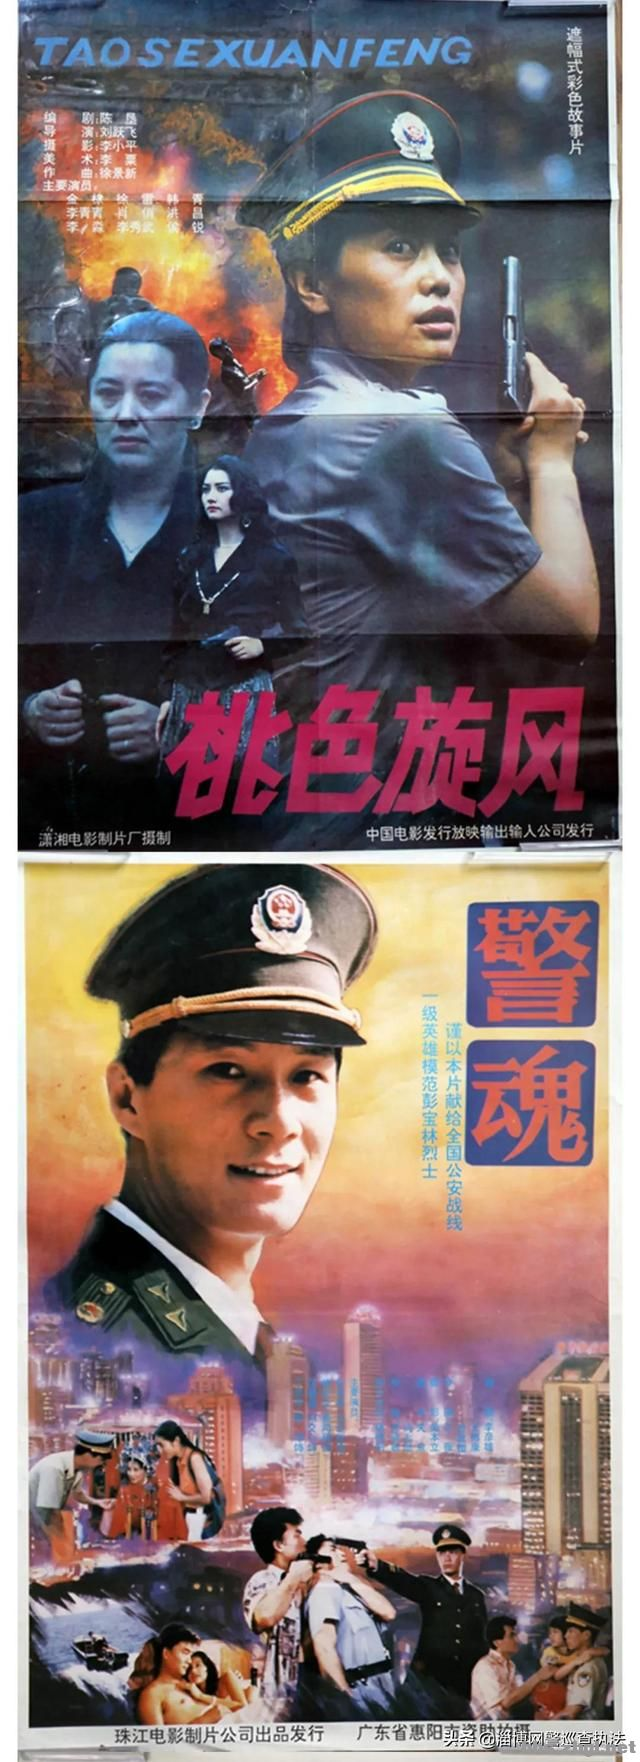 YYDS!这些电影里的警察陪伴了多少人的青春......-5.jpg